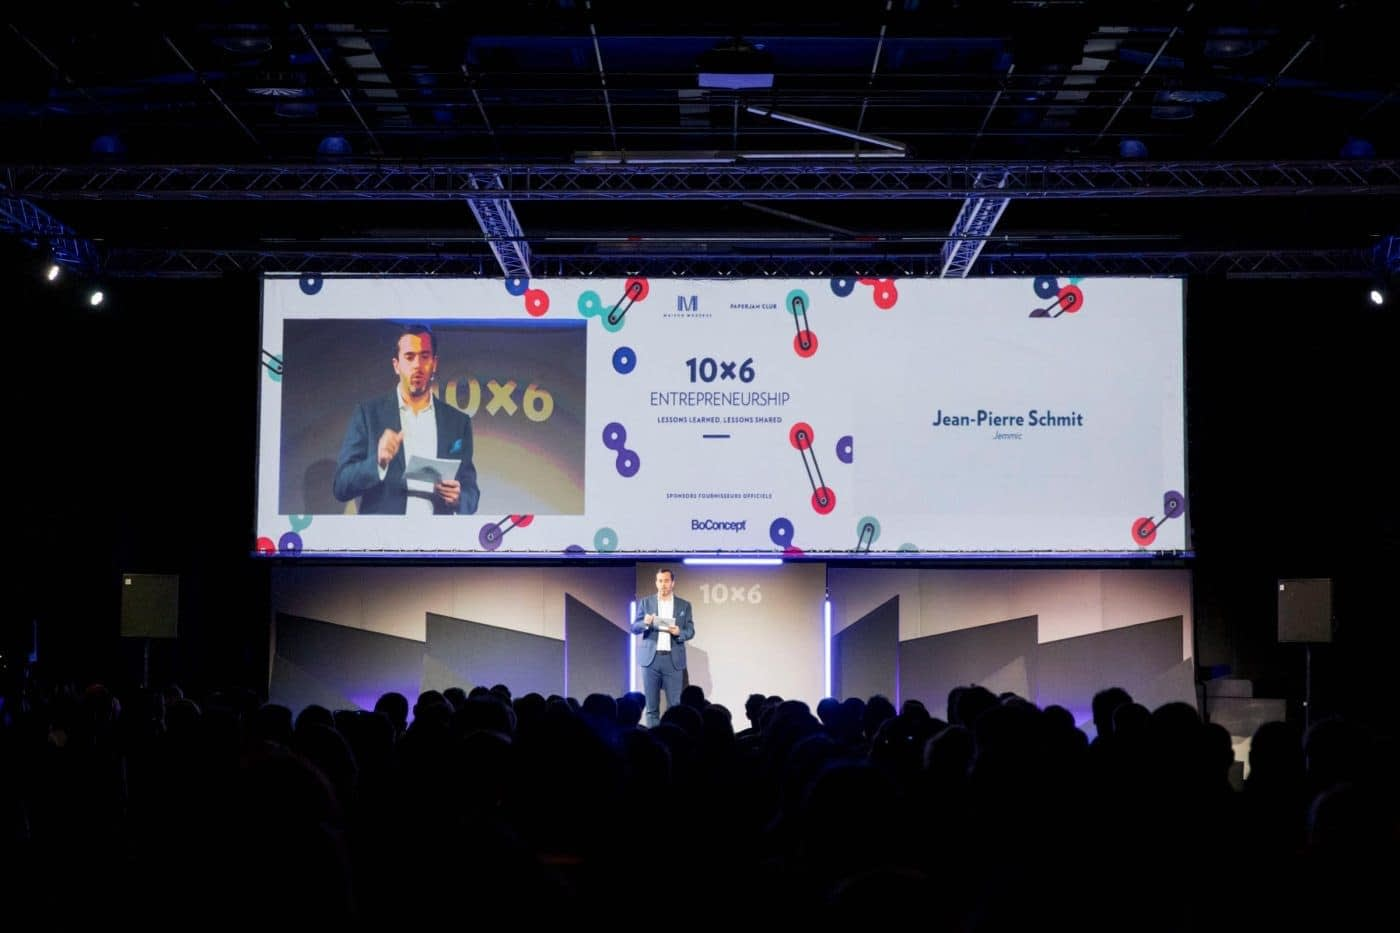 Jemmic at 10×6 Entrepreneurship: lessons learned, lessons shared